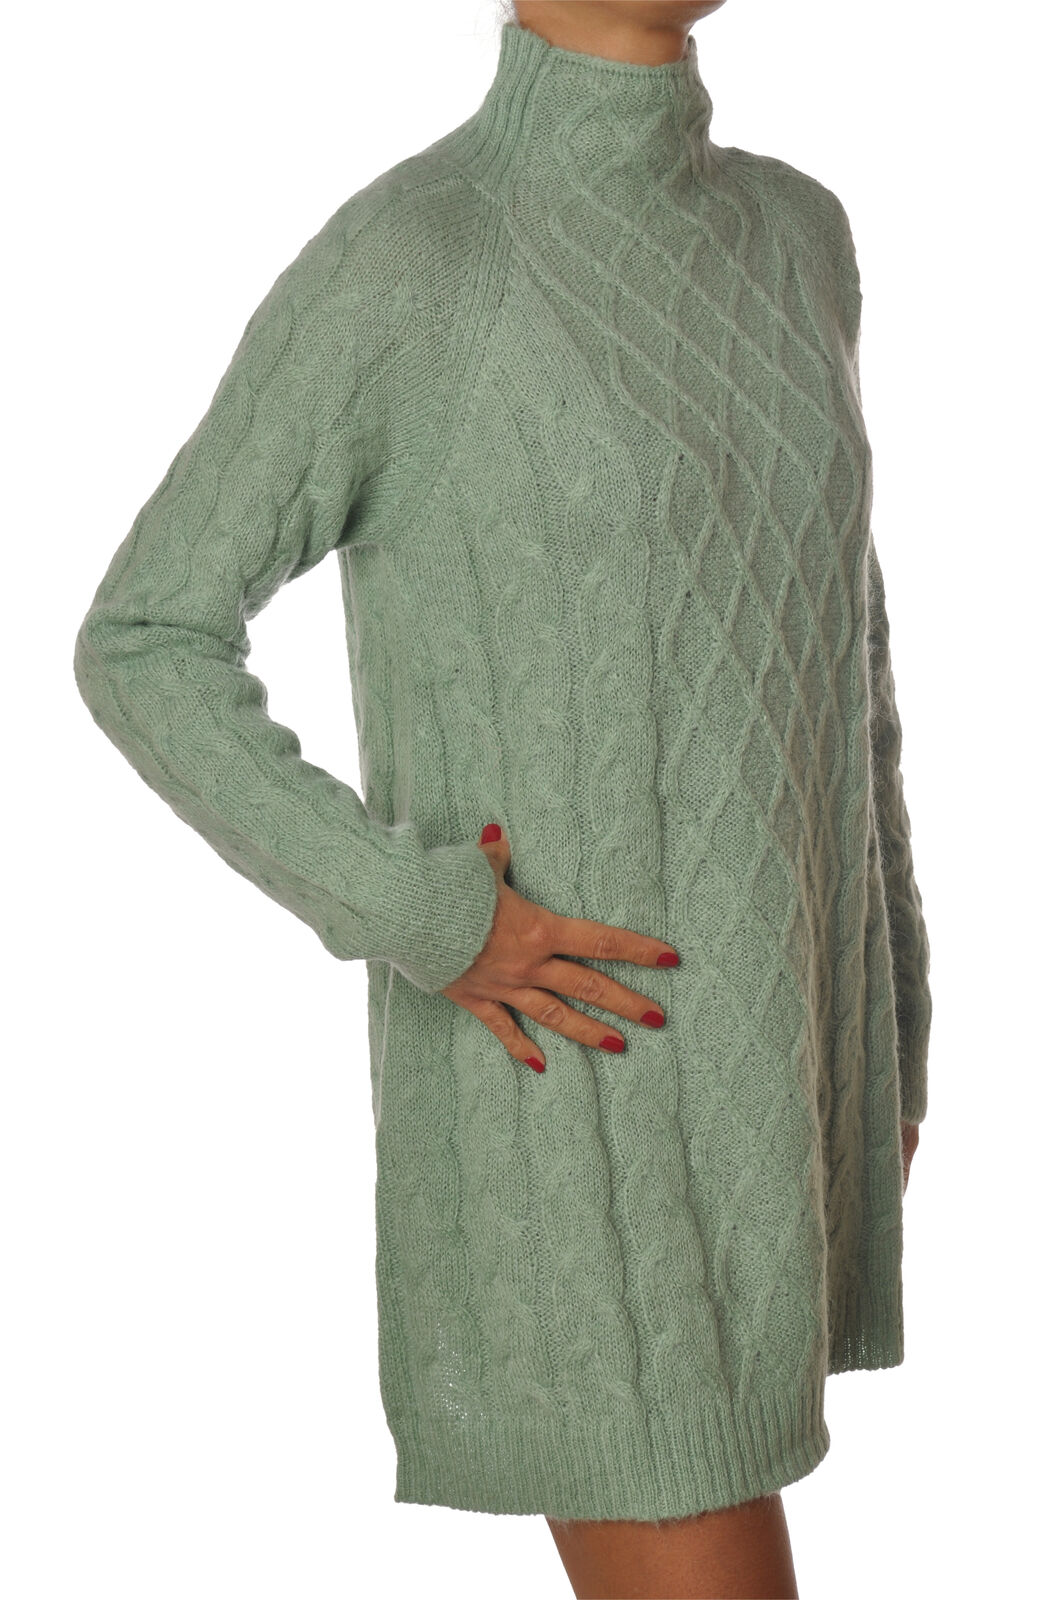 Ottod'ame - Abiti-Abito - women - green - 5669429N184341